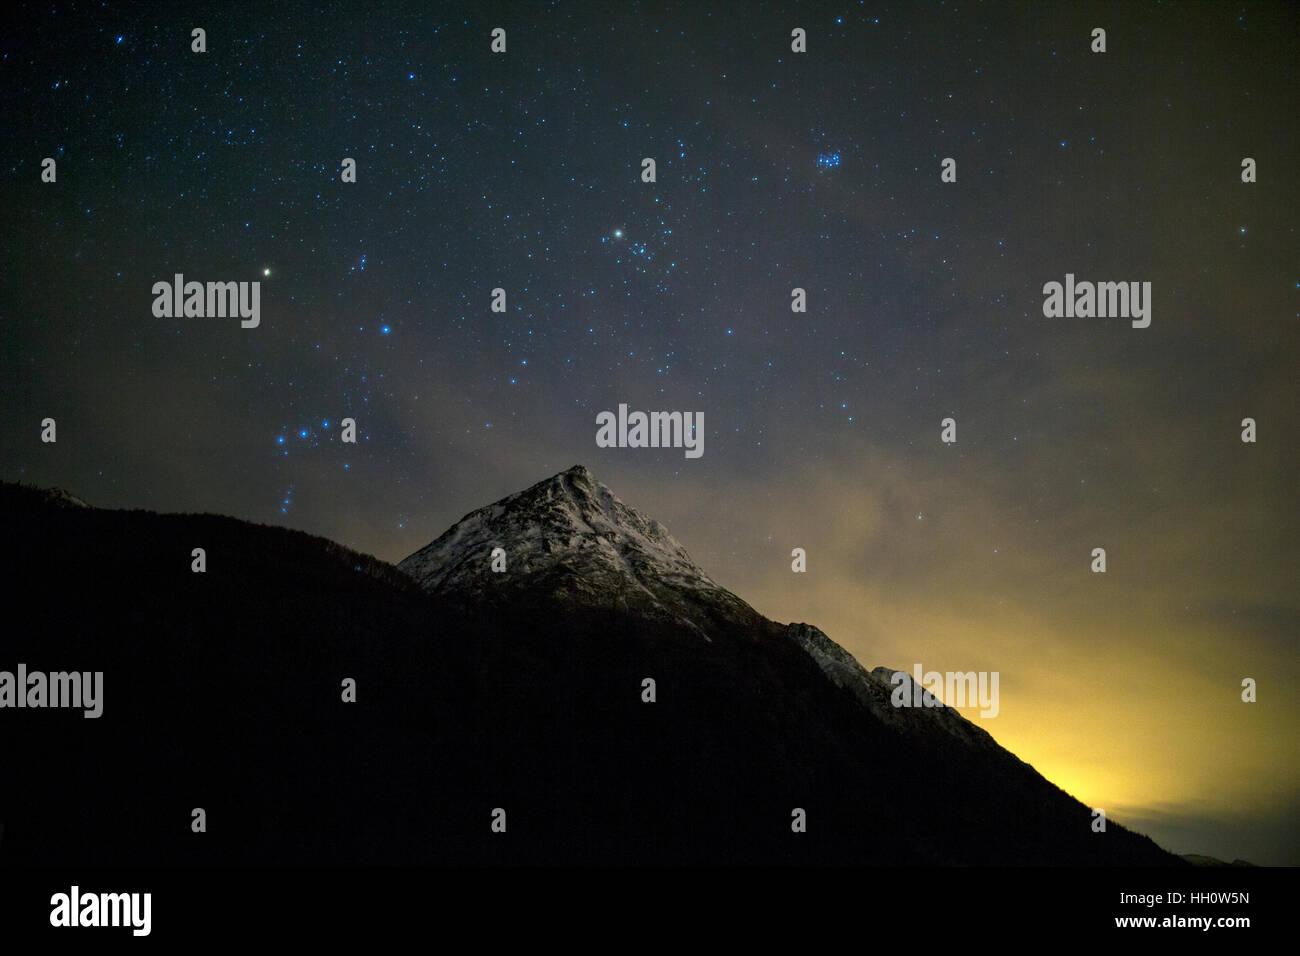 Stars of the night sky - Stock Image